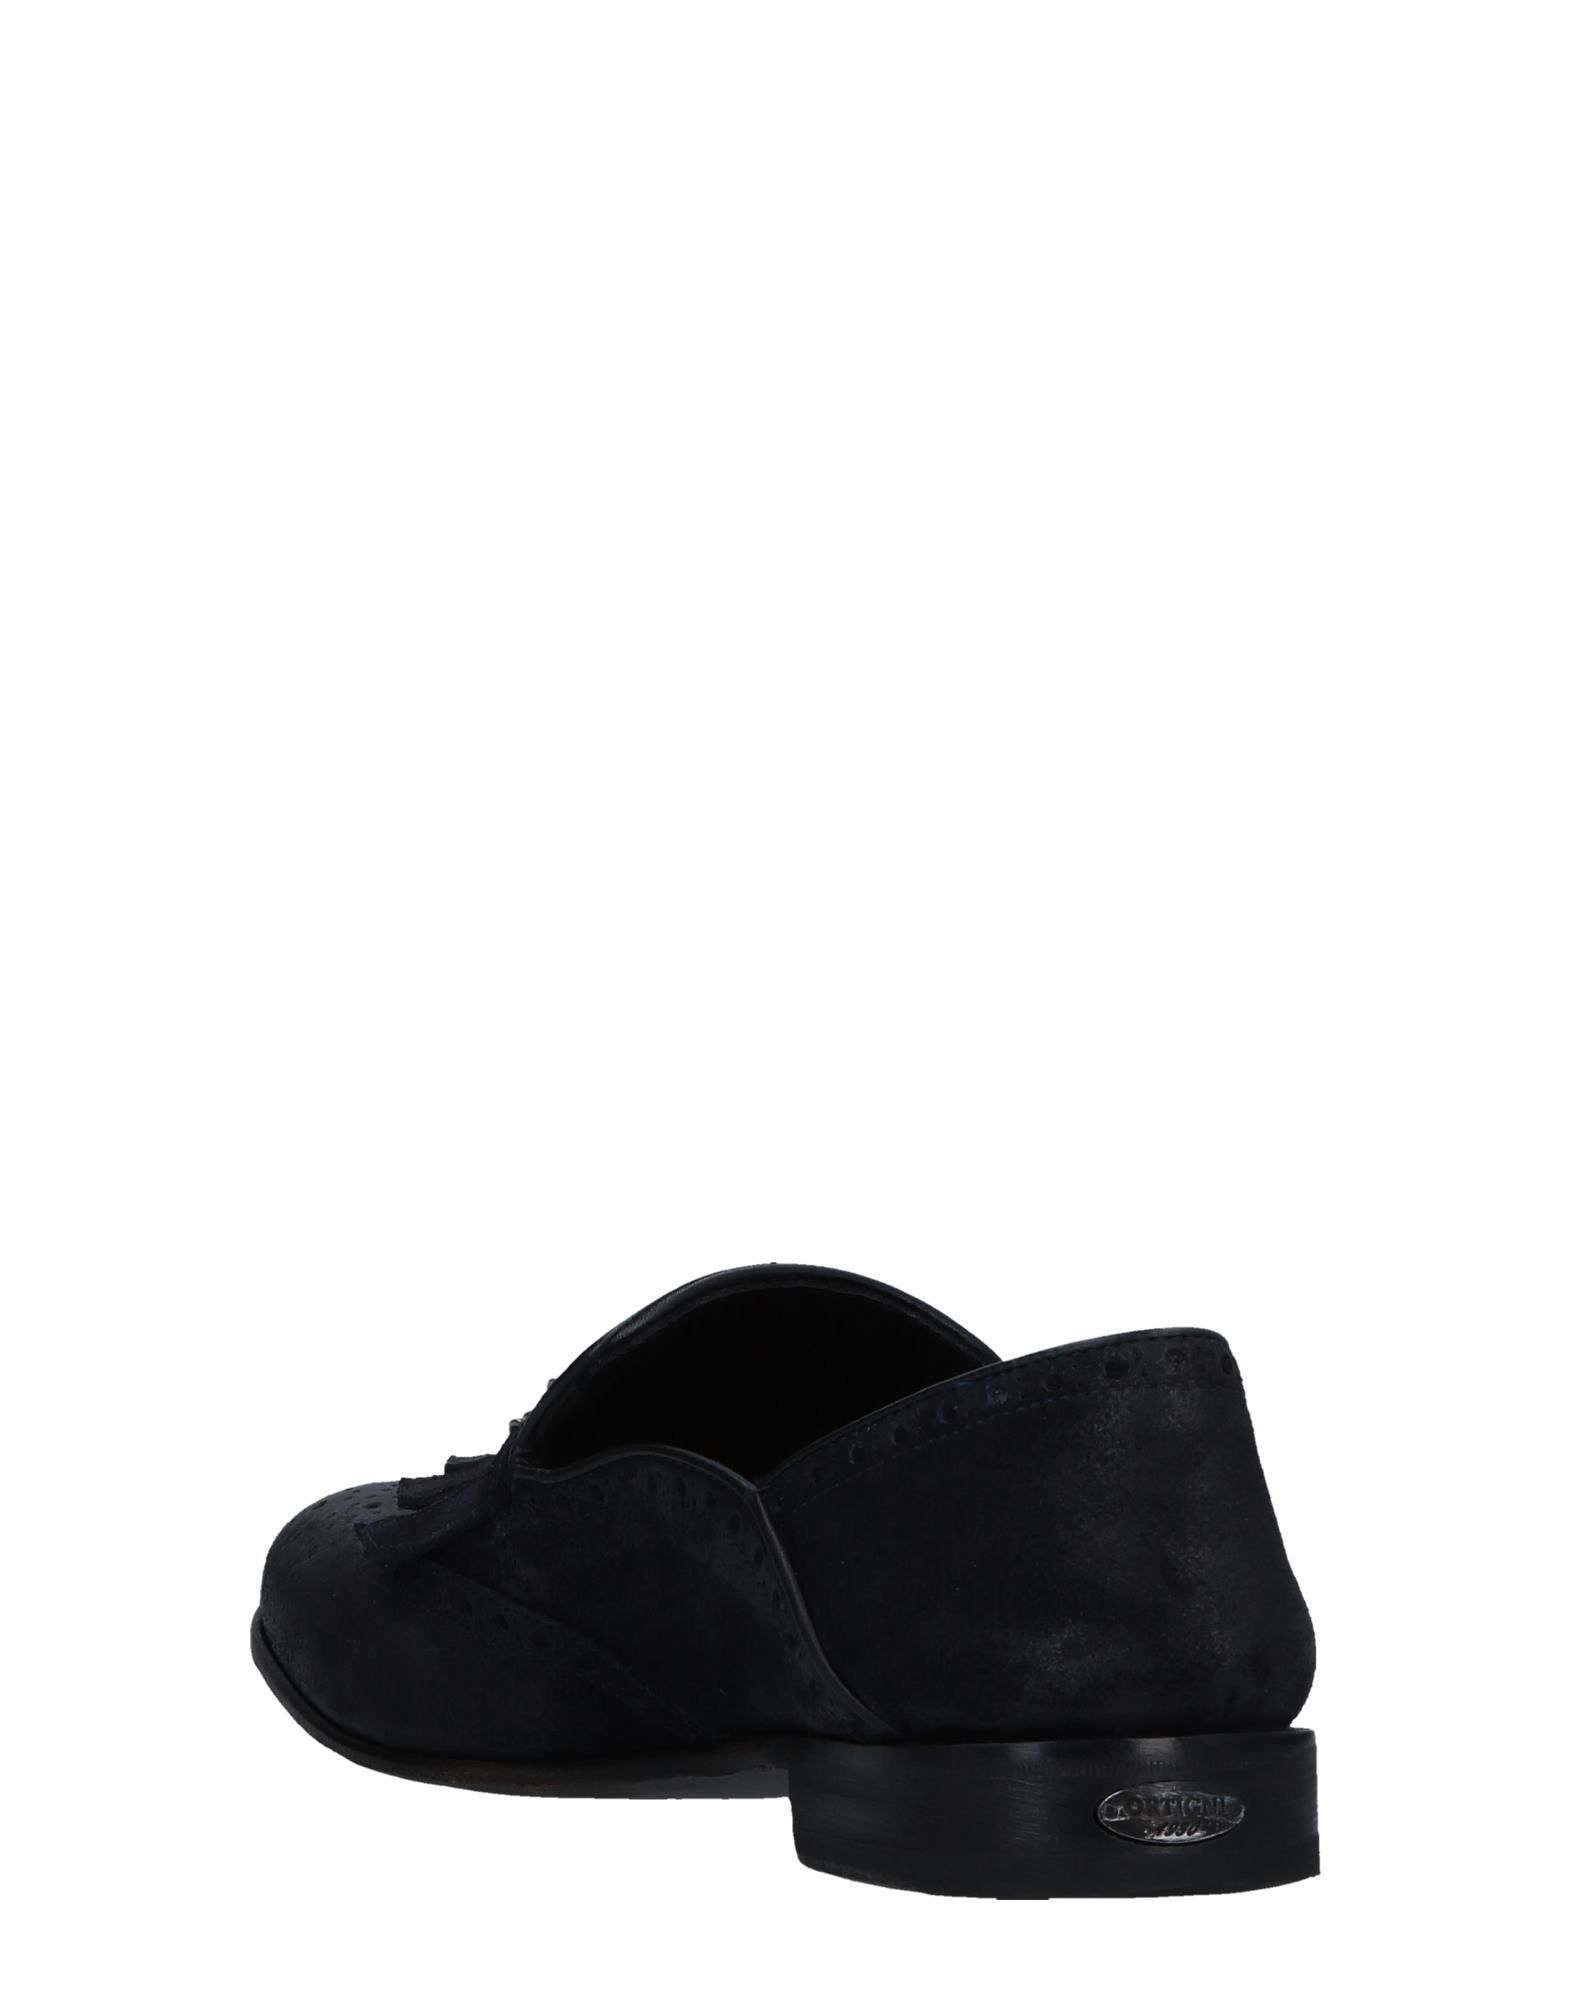 Filippo Scuffi Per Qualität Ortigni Mokassins Herren  11515738LN Gute Qualität Per beliebte Schuhe fcdc78